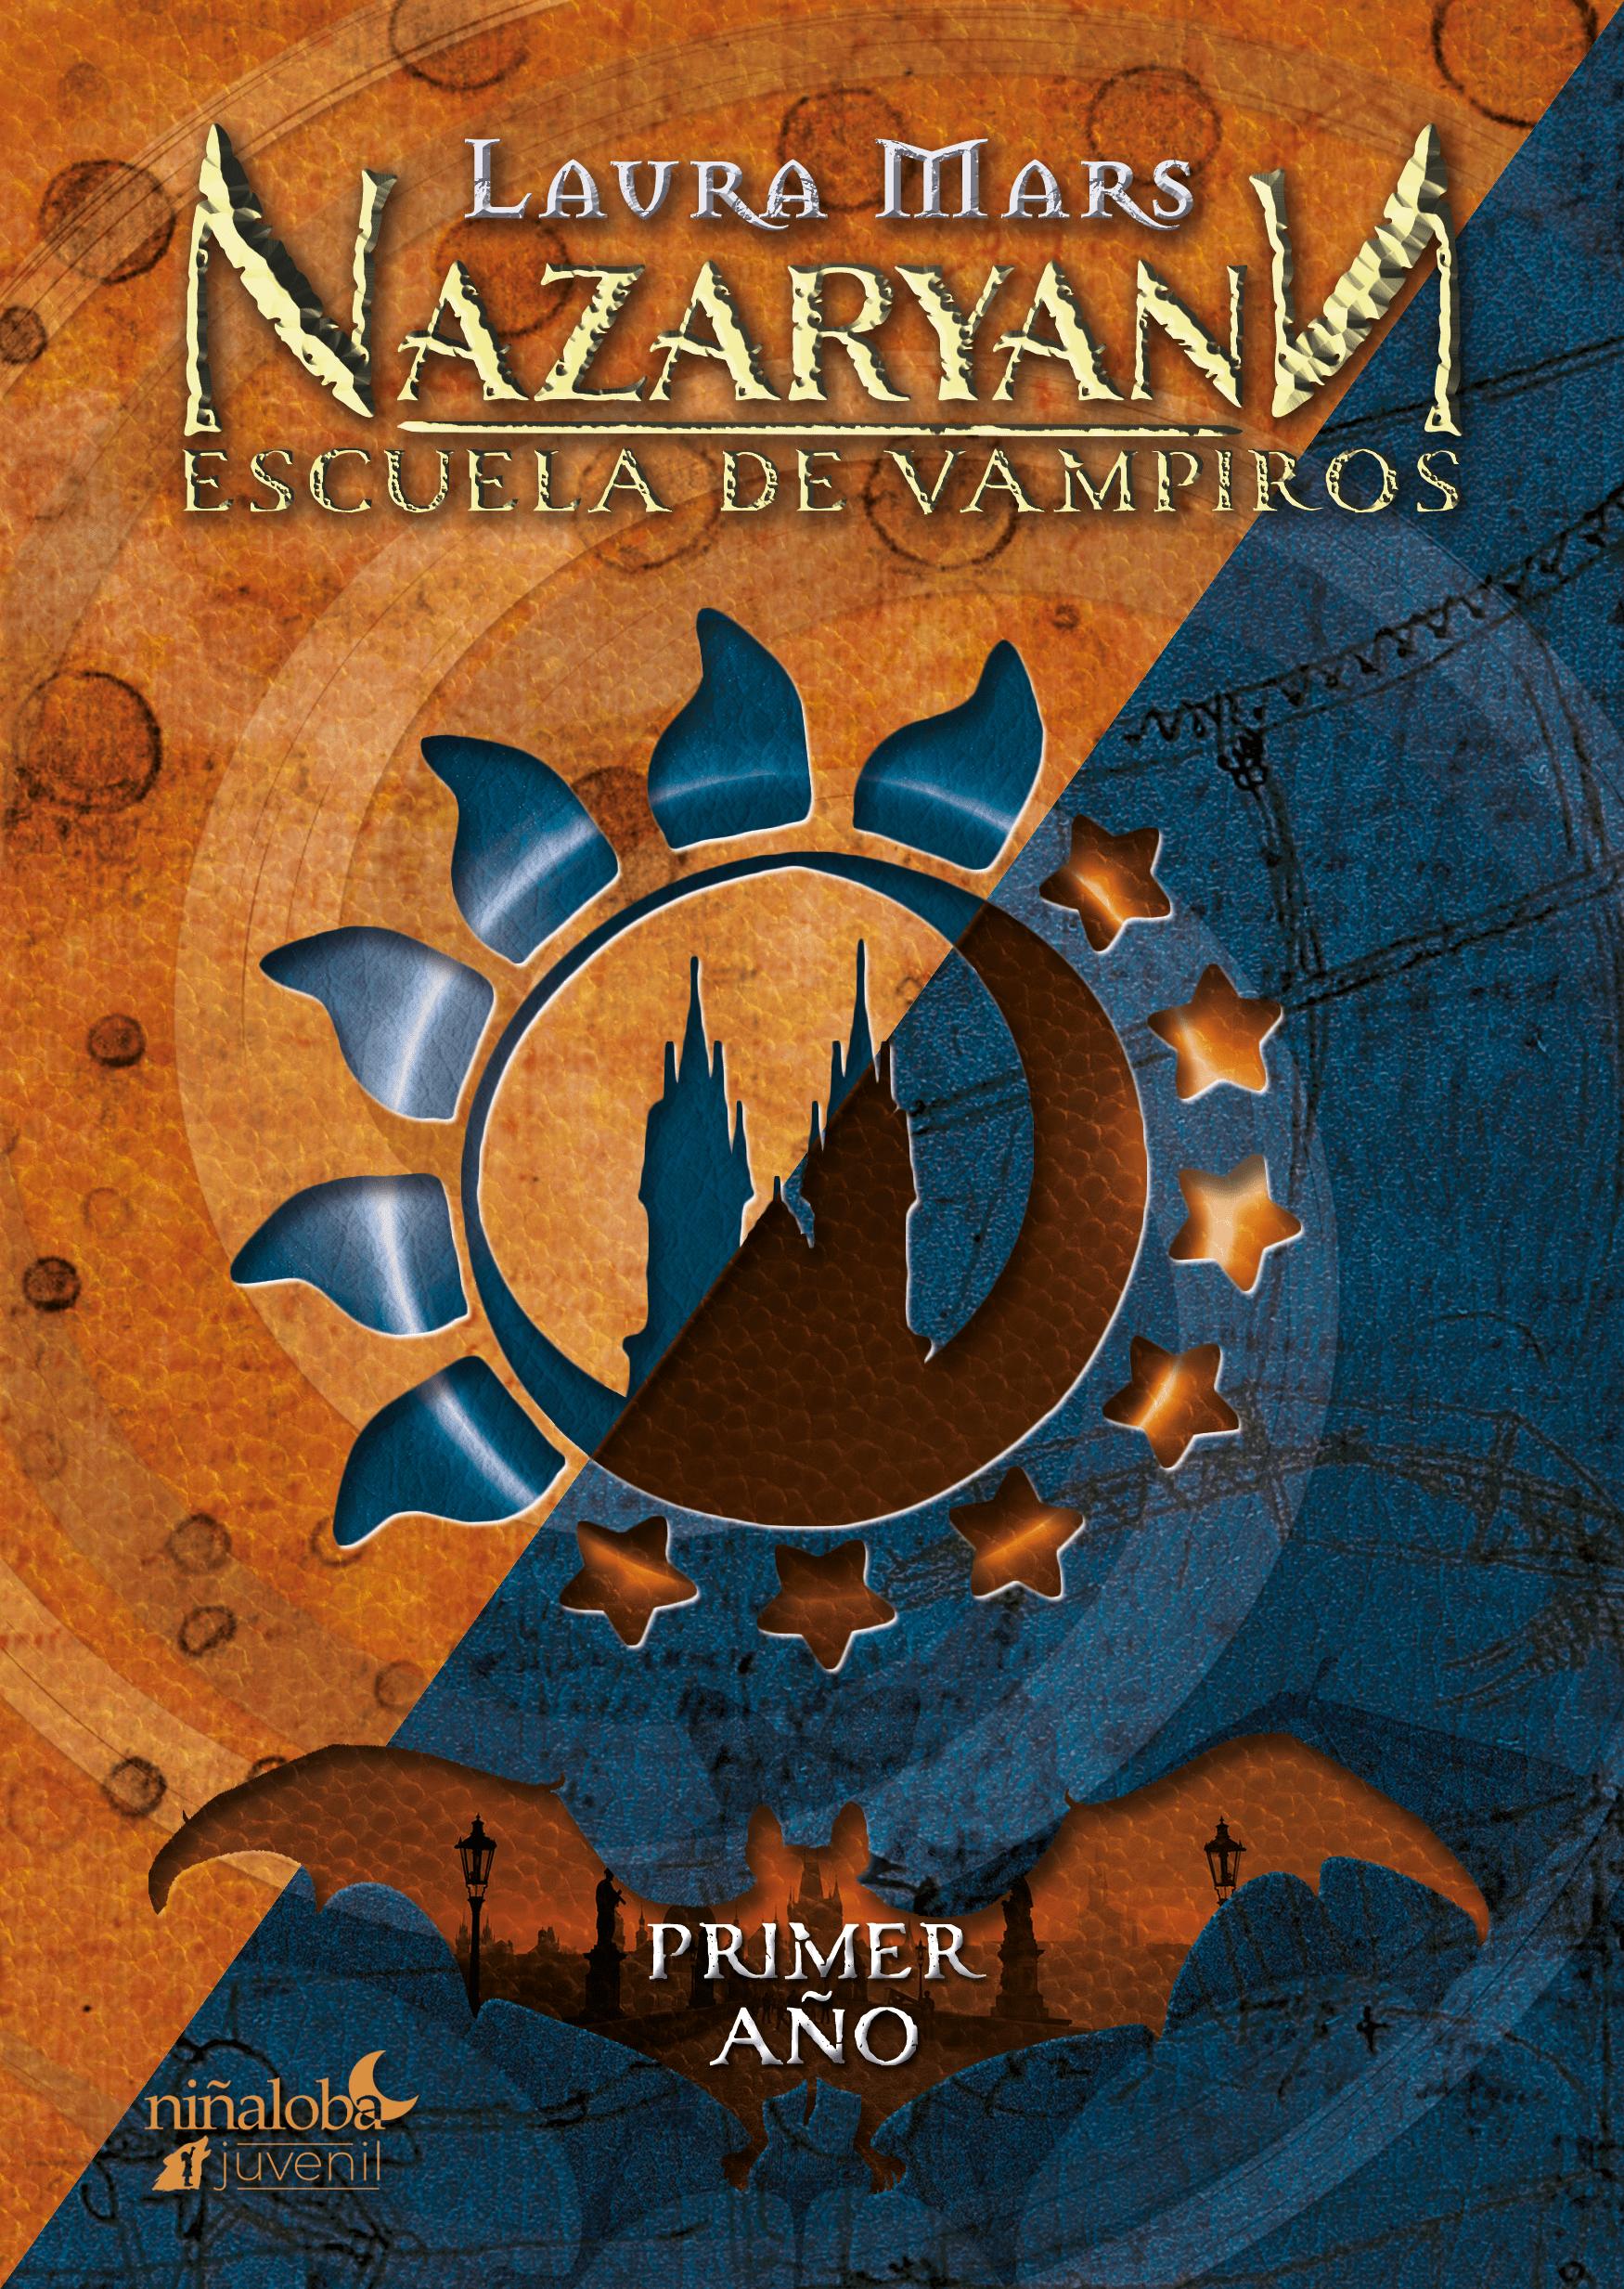 Reseña Nazaryann Escuela de Vampiros: Primer año, de Laura Mars - Cine de Escritor